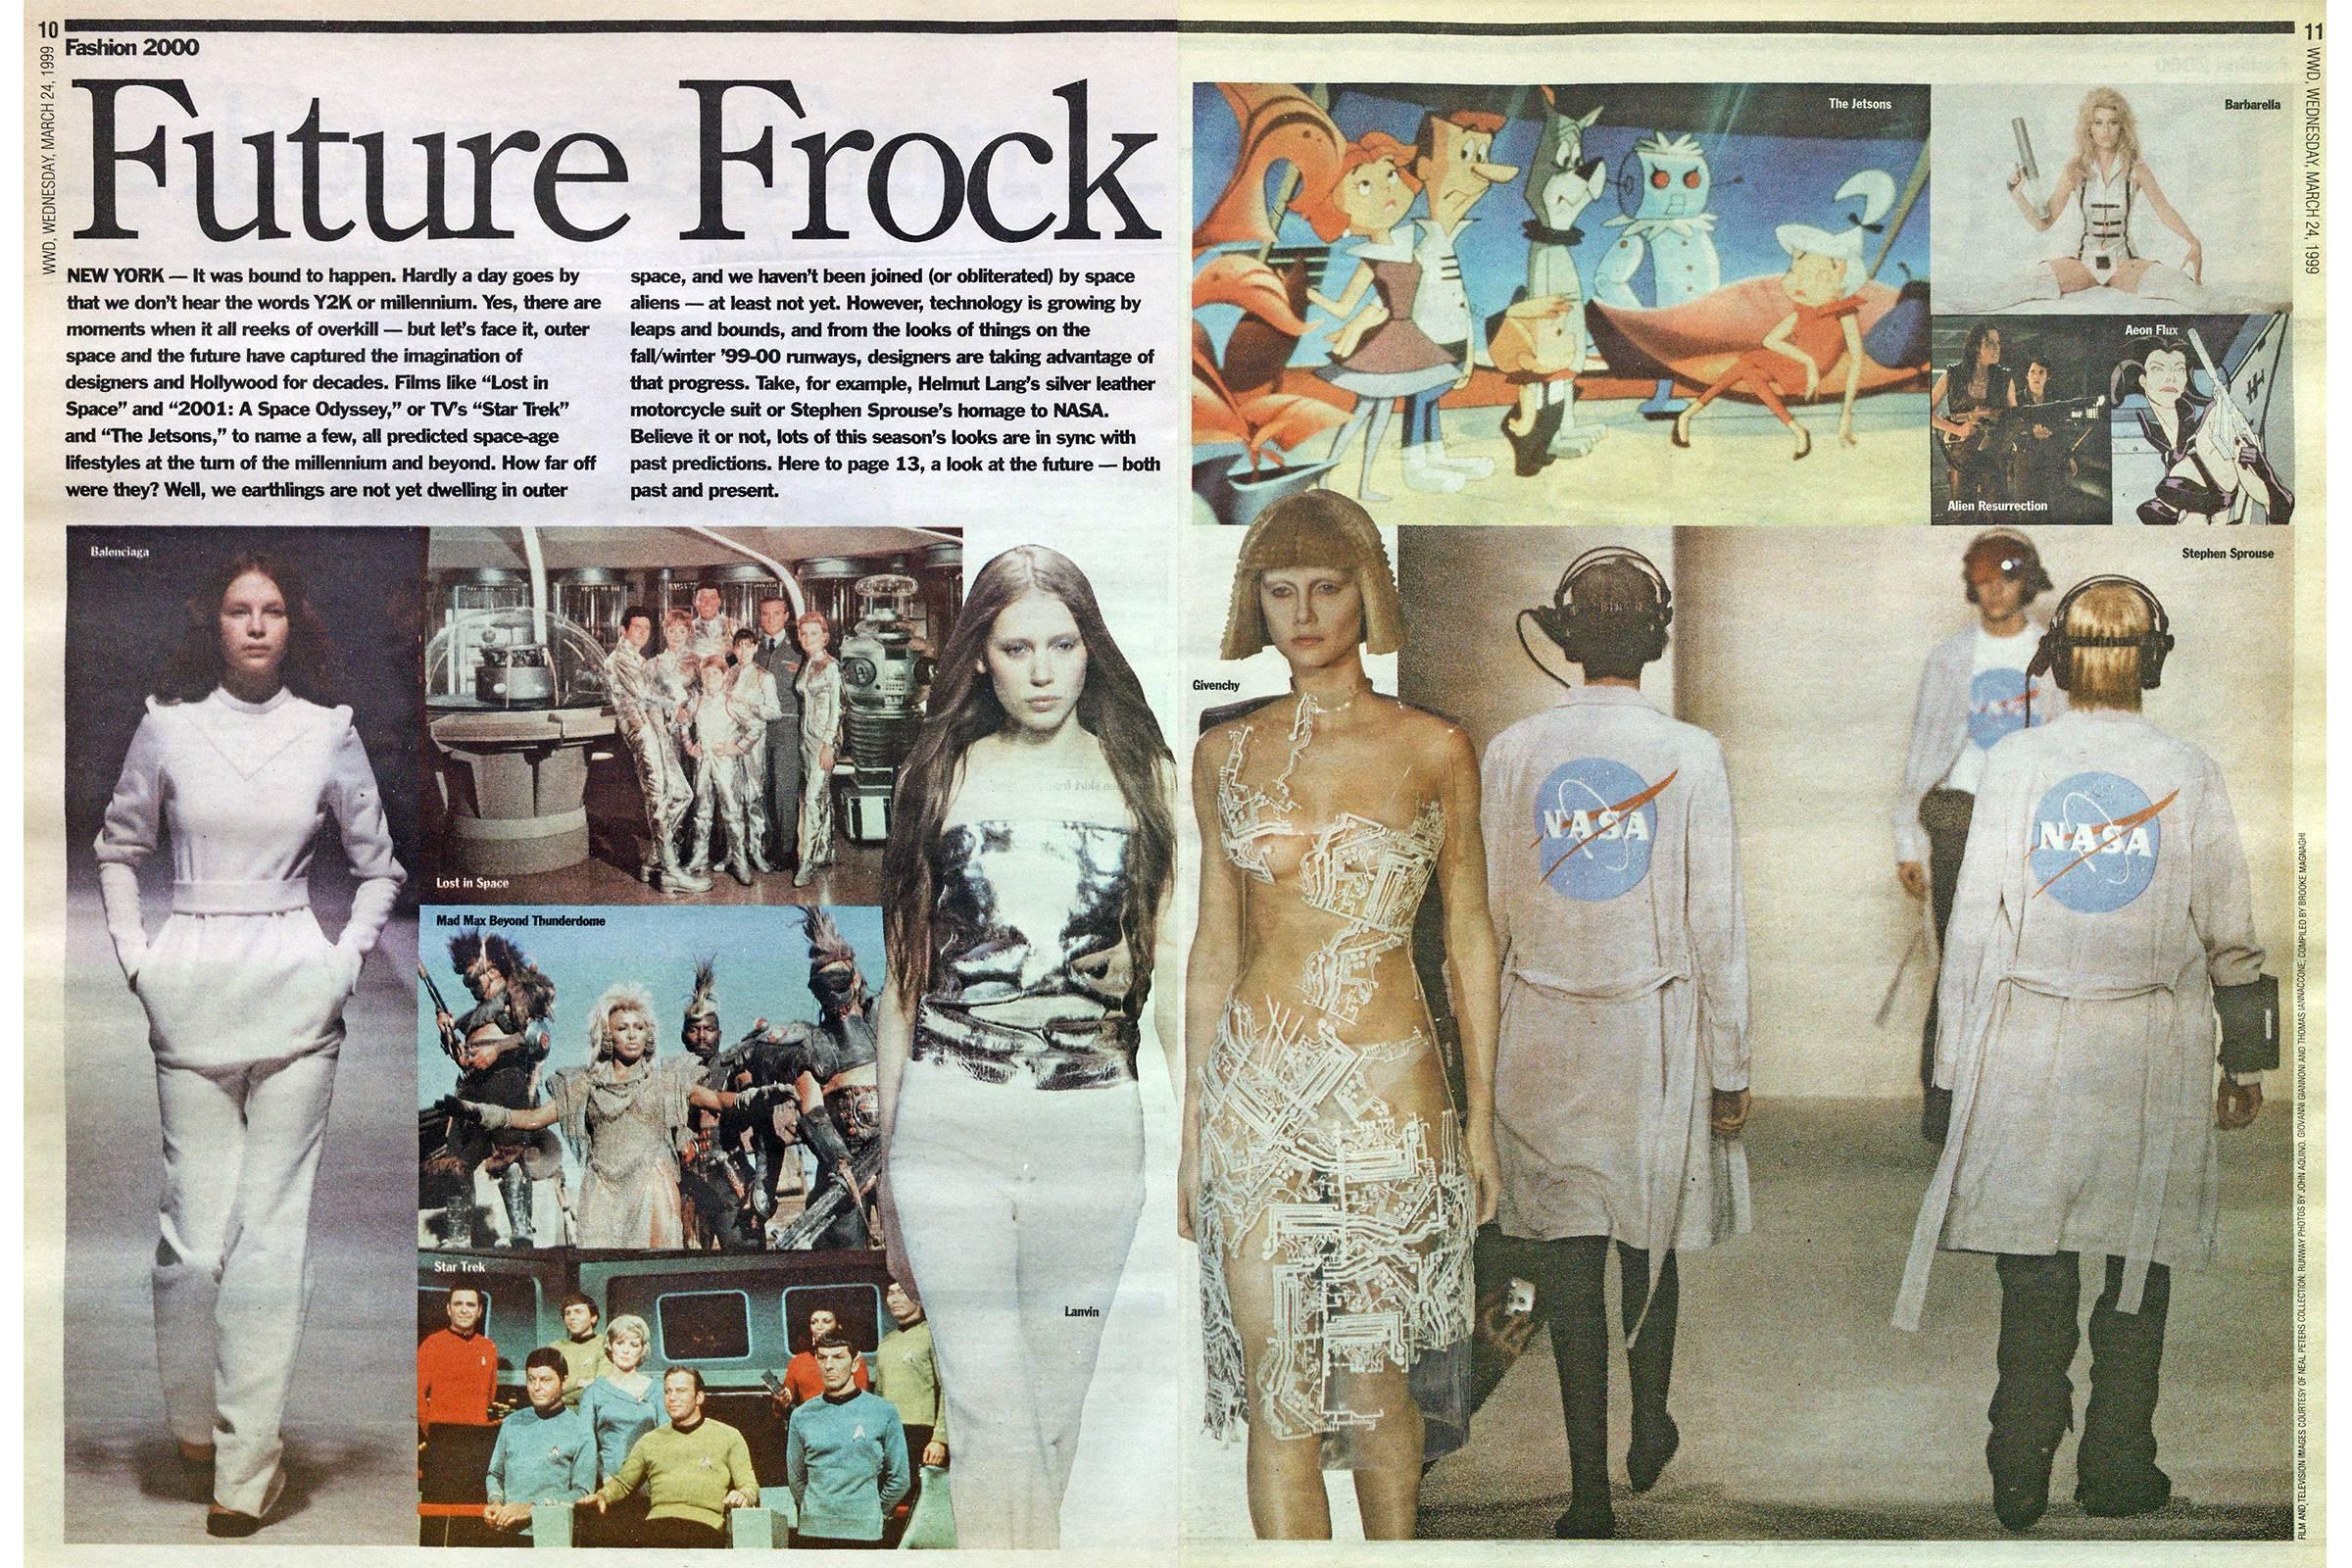 Heroine: Twenty Years On - Fashion at the Millennium